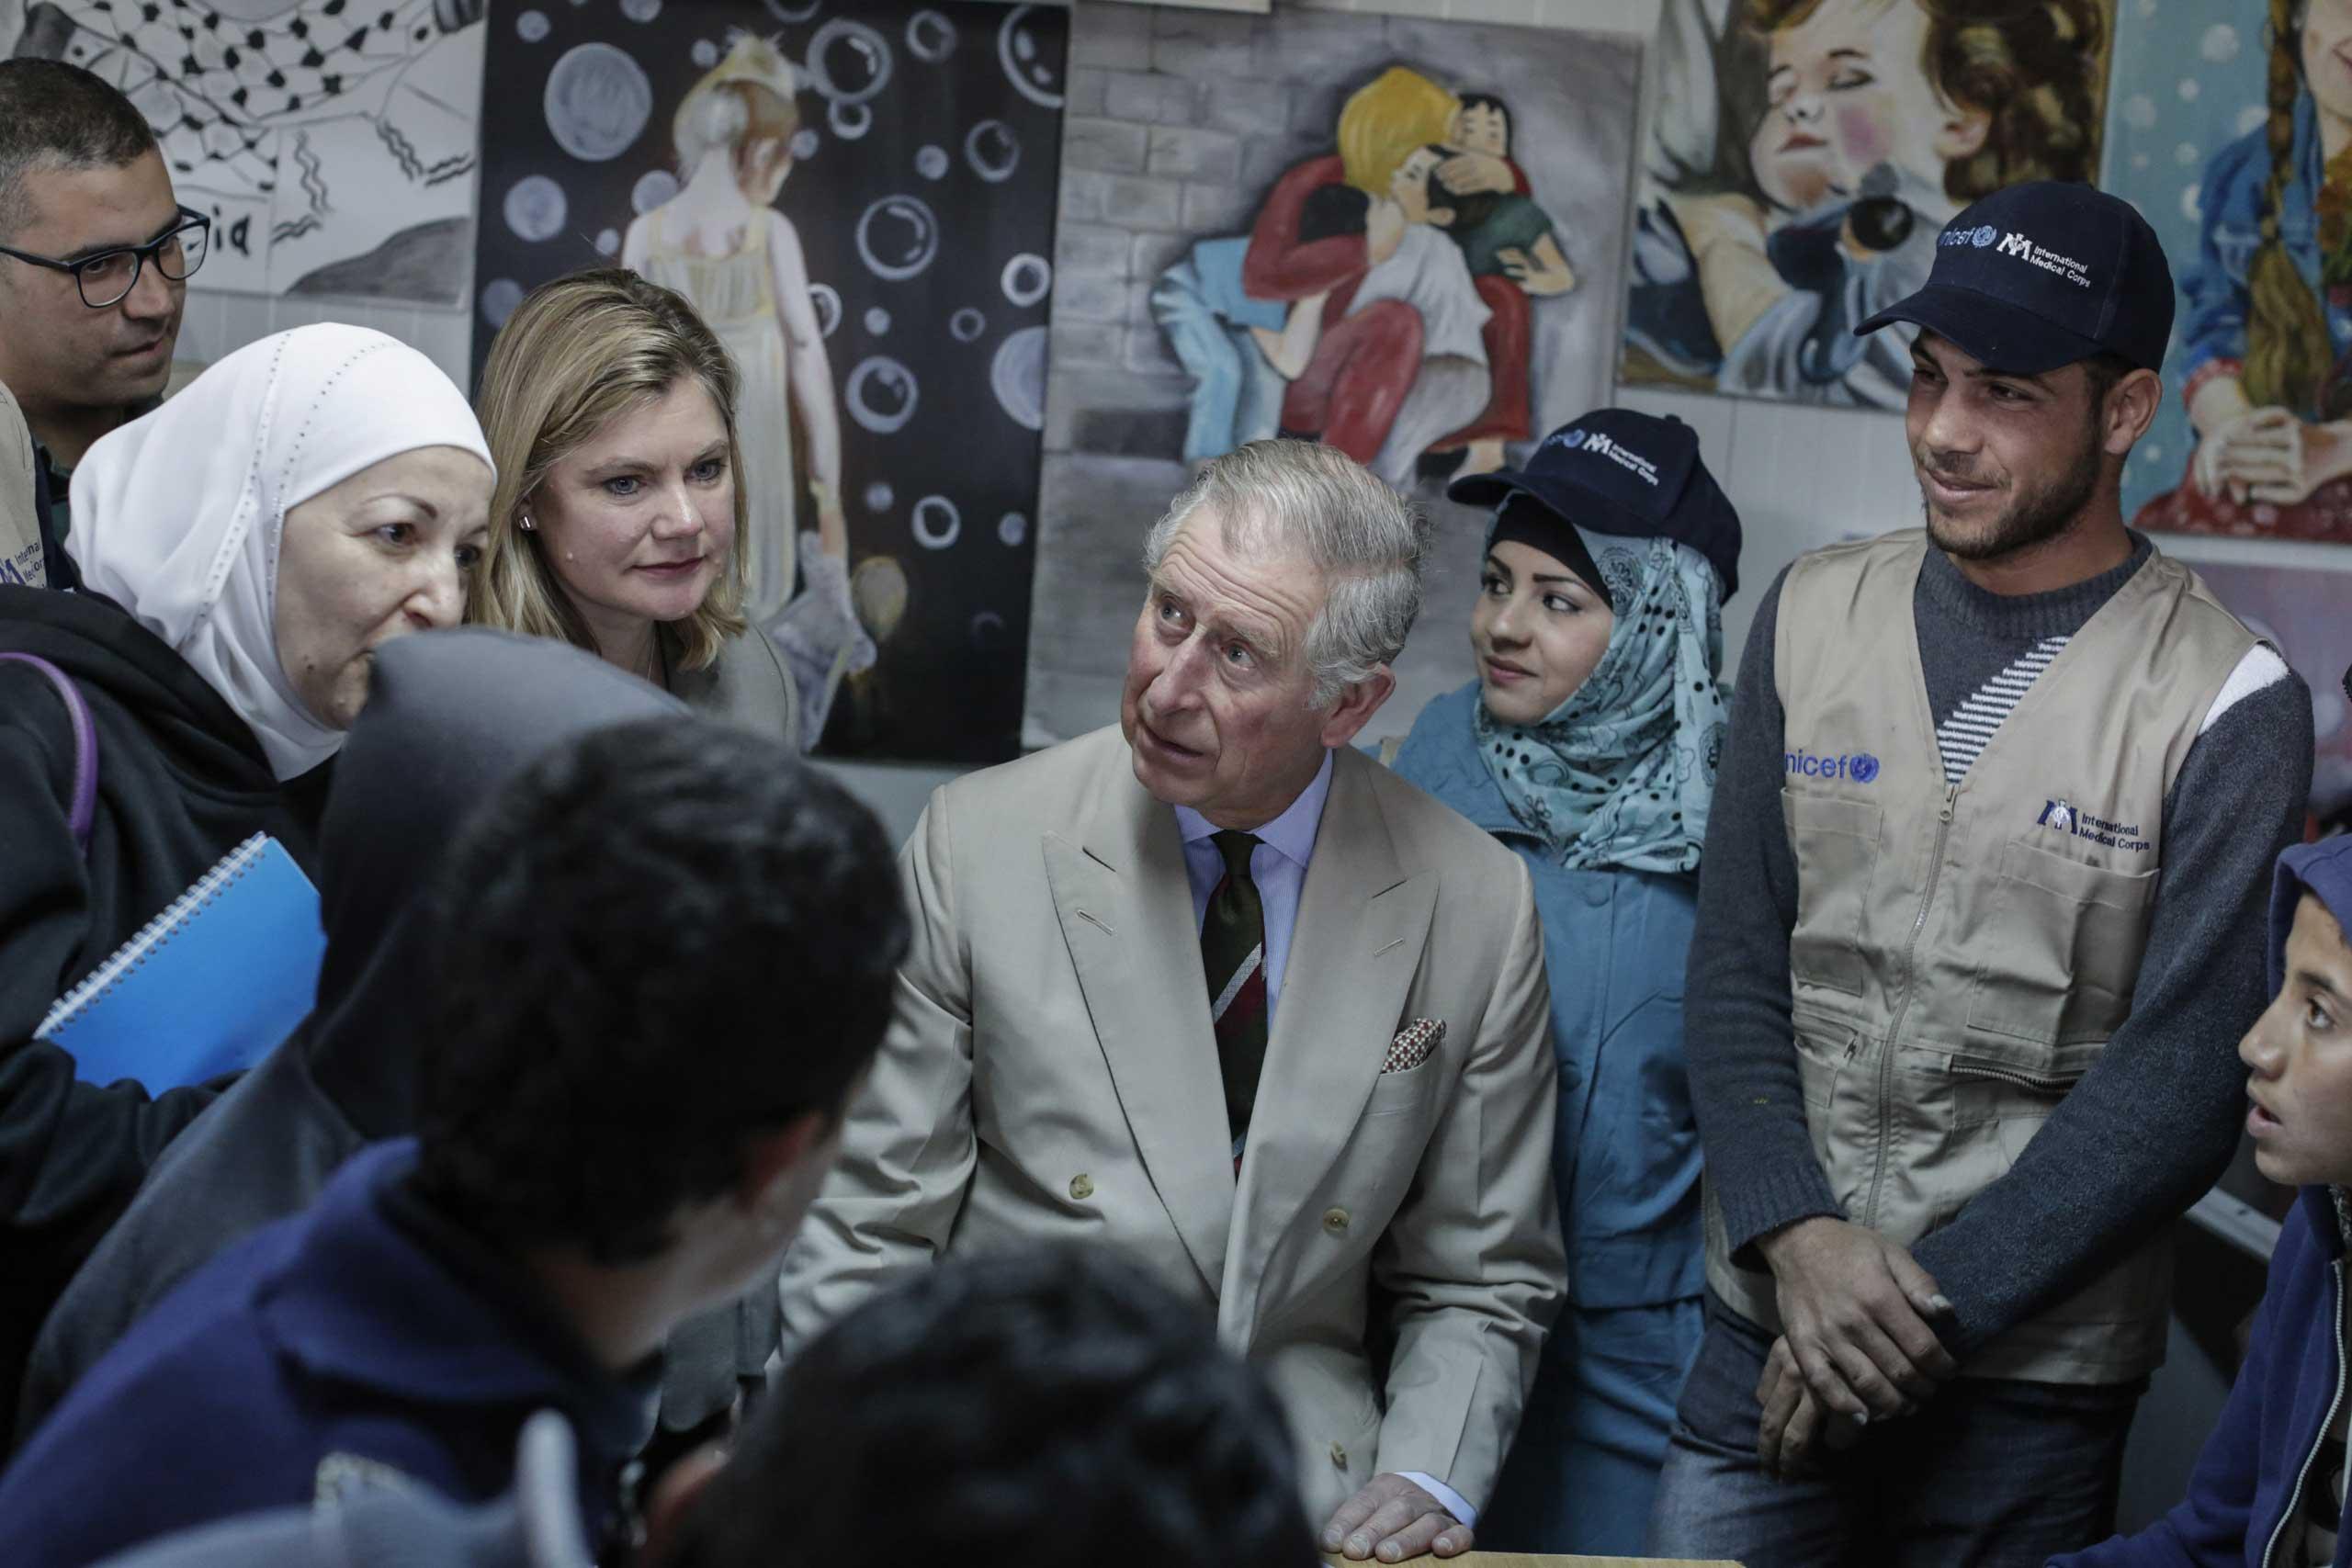 Prince Charles visits Zaatari refugee camp in Jordan, Feb. 8, 2015.